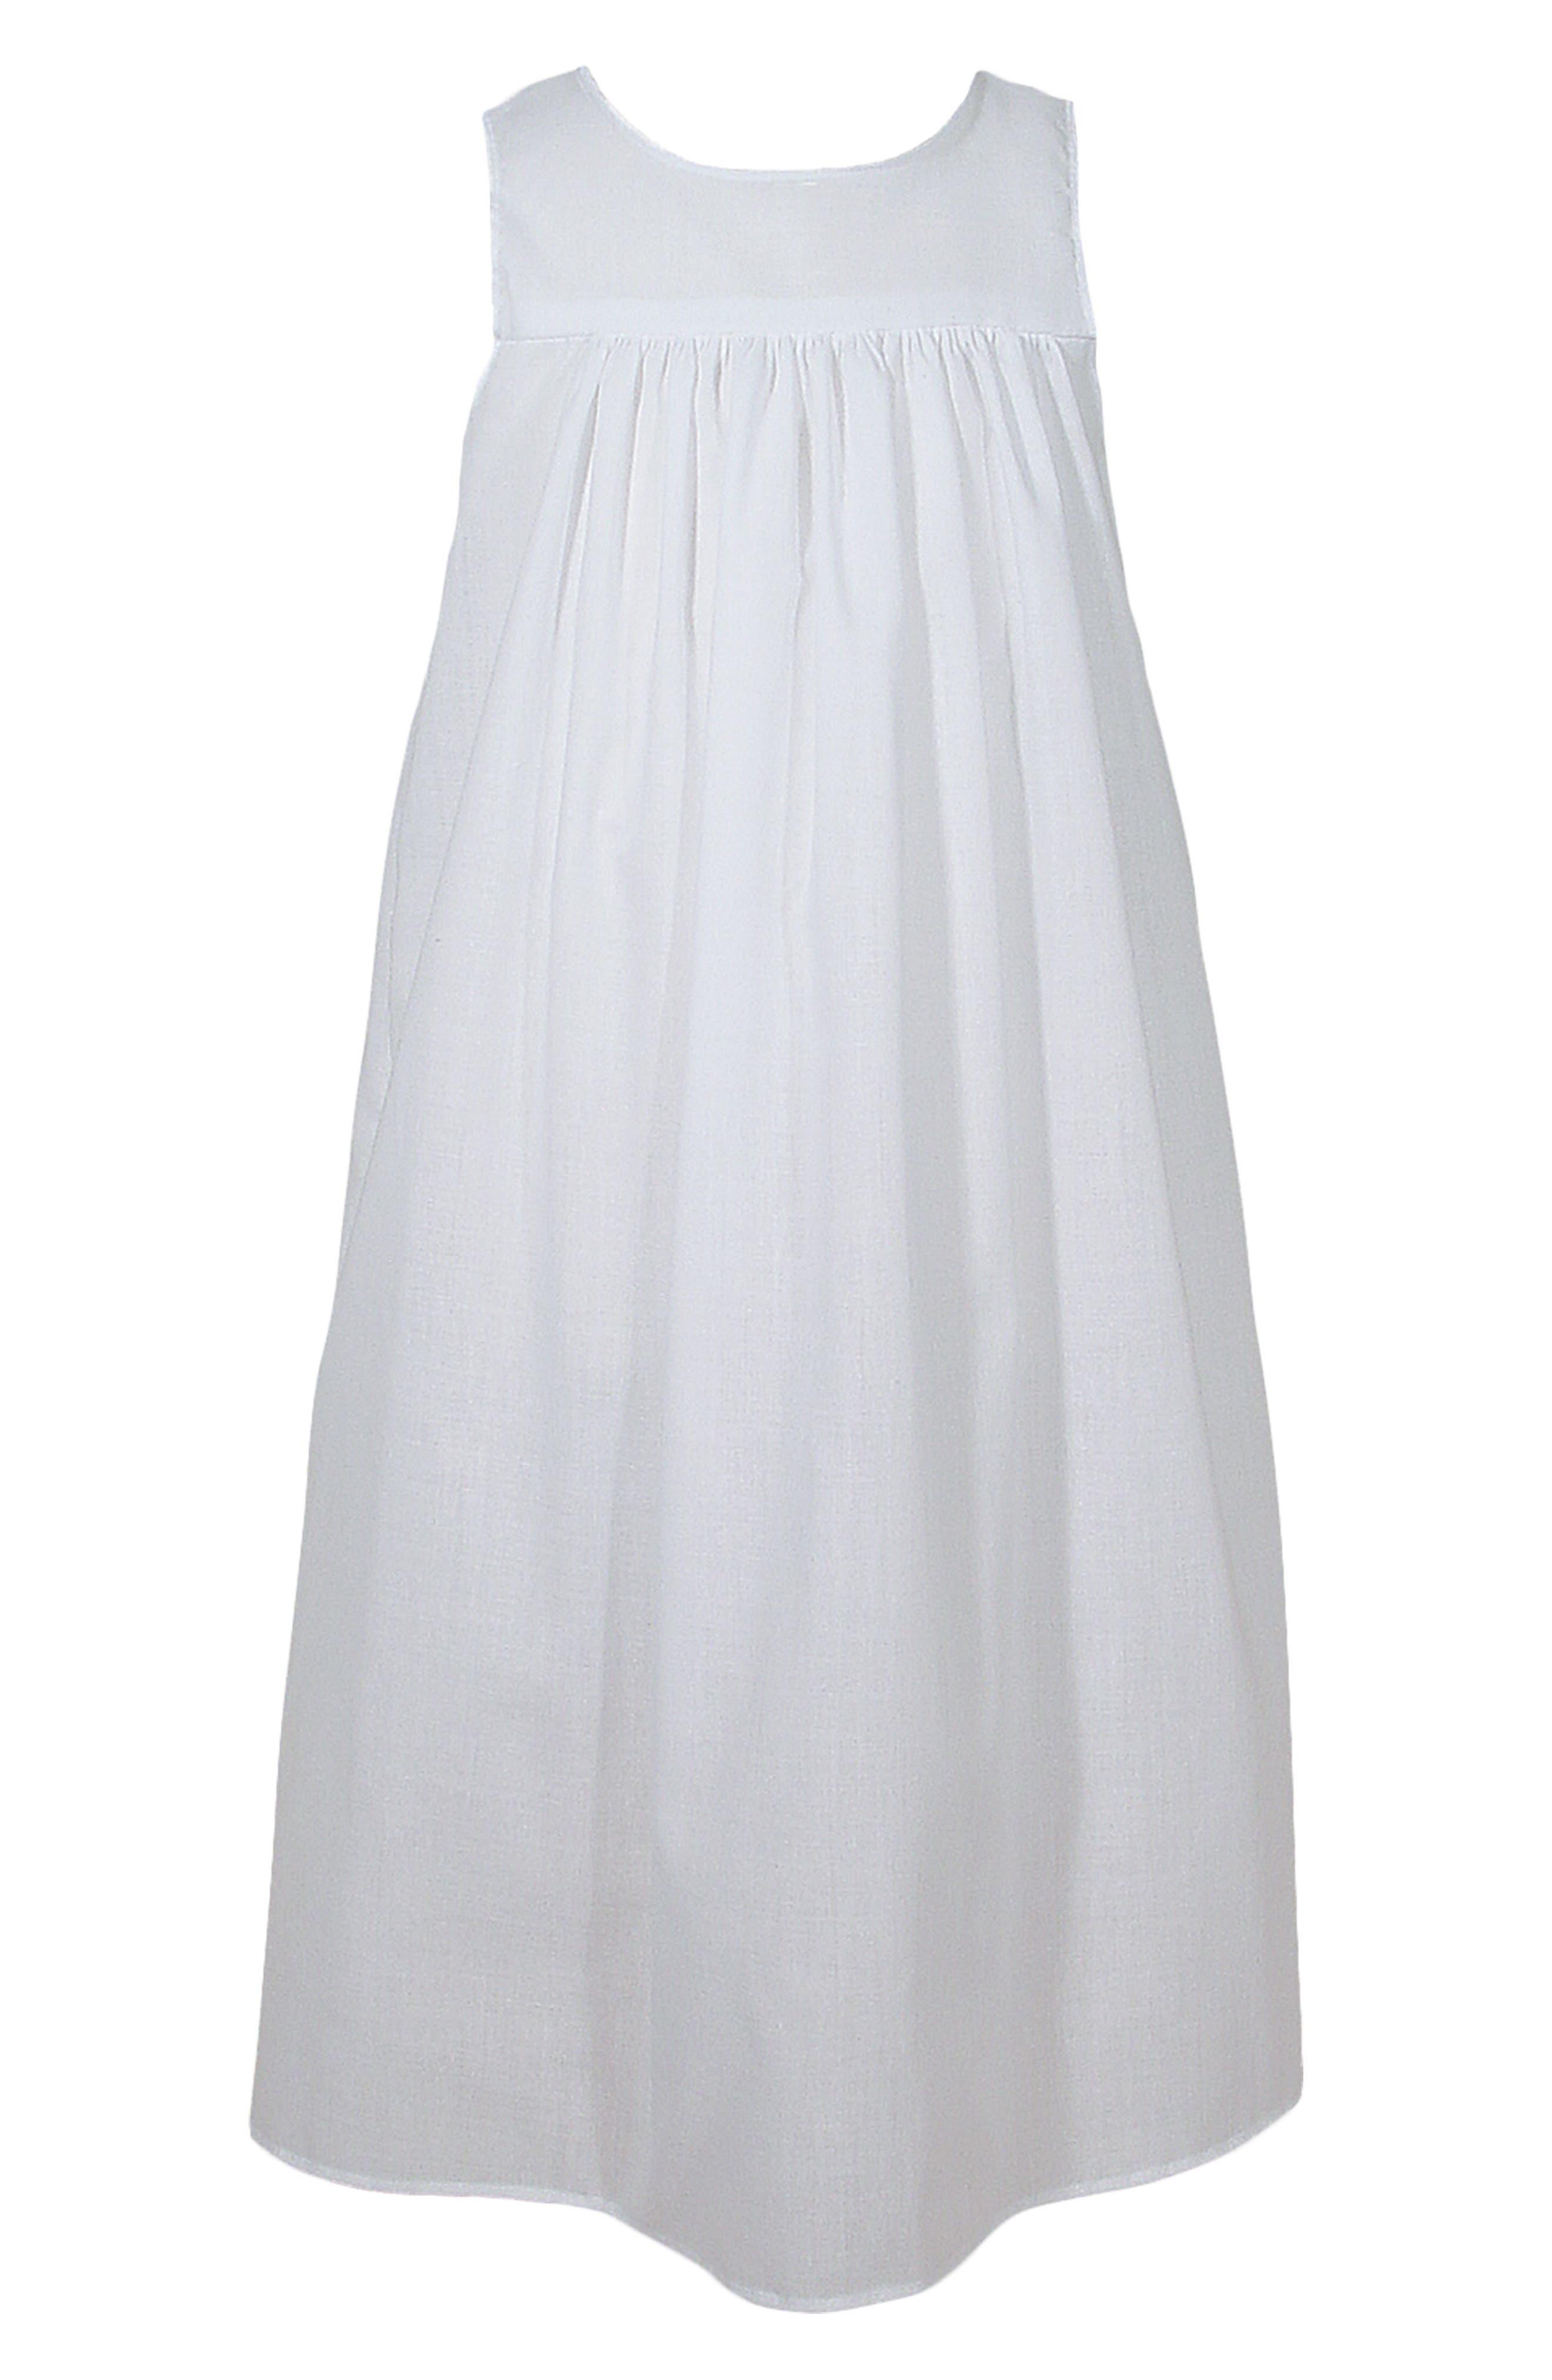 Christening Gown Slip,                             Main thumbnail 1, color,                             White